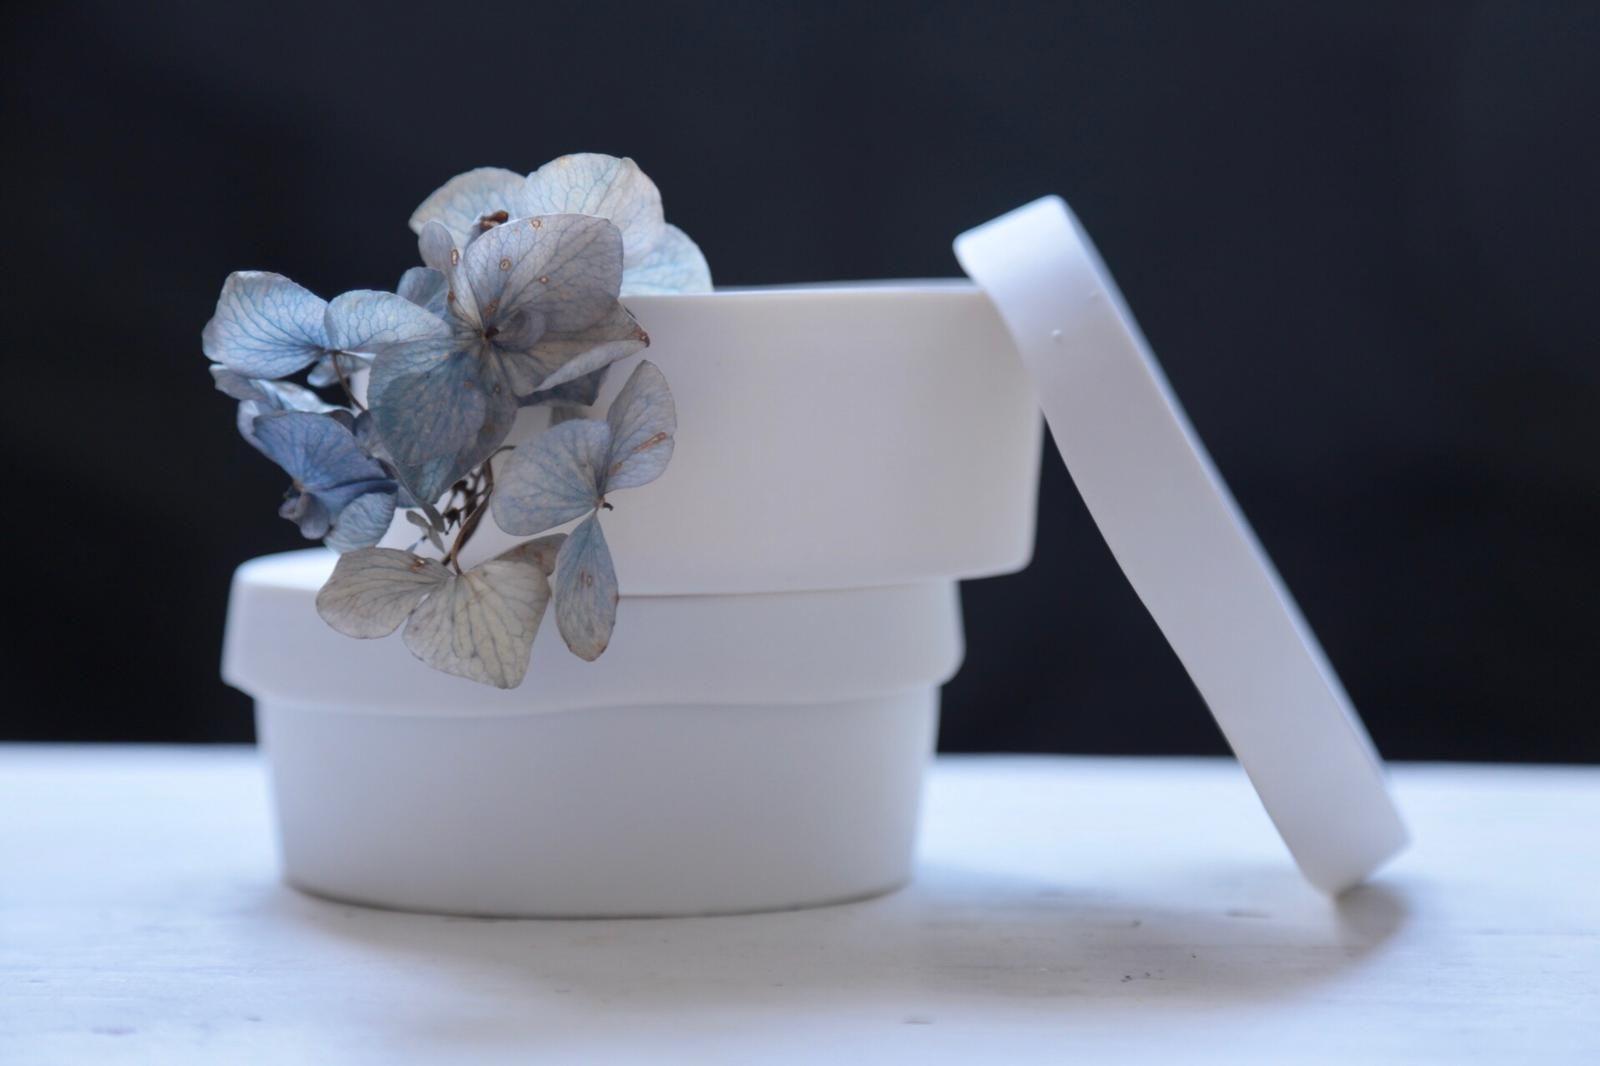 #candies #lilacandles #bougie #naturalcandles #porcelain #handmade #homesweethome #myriamaitamarceramics